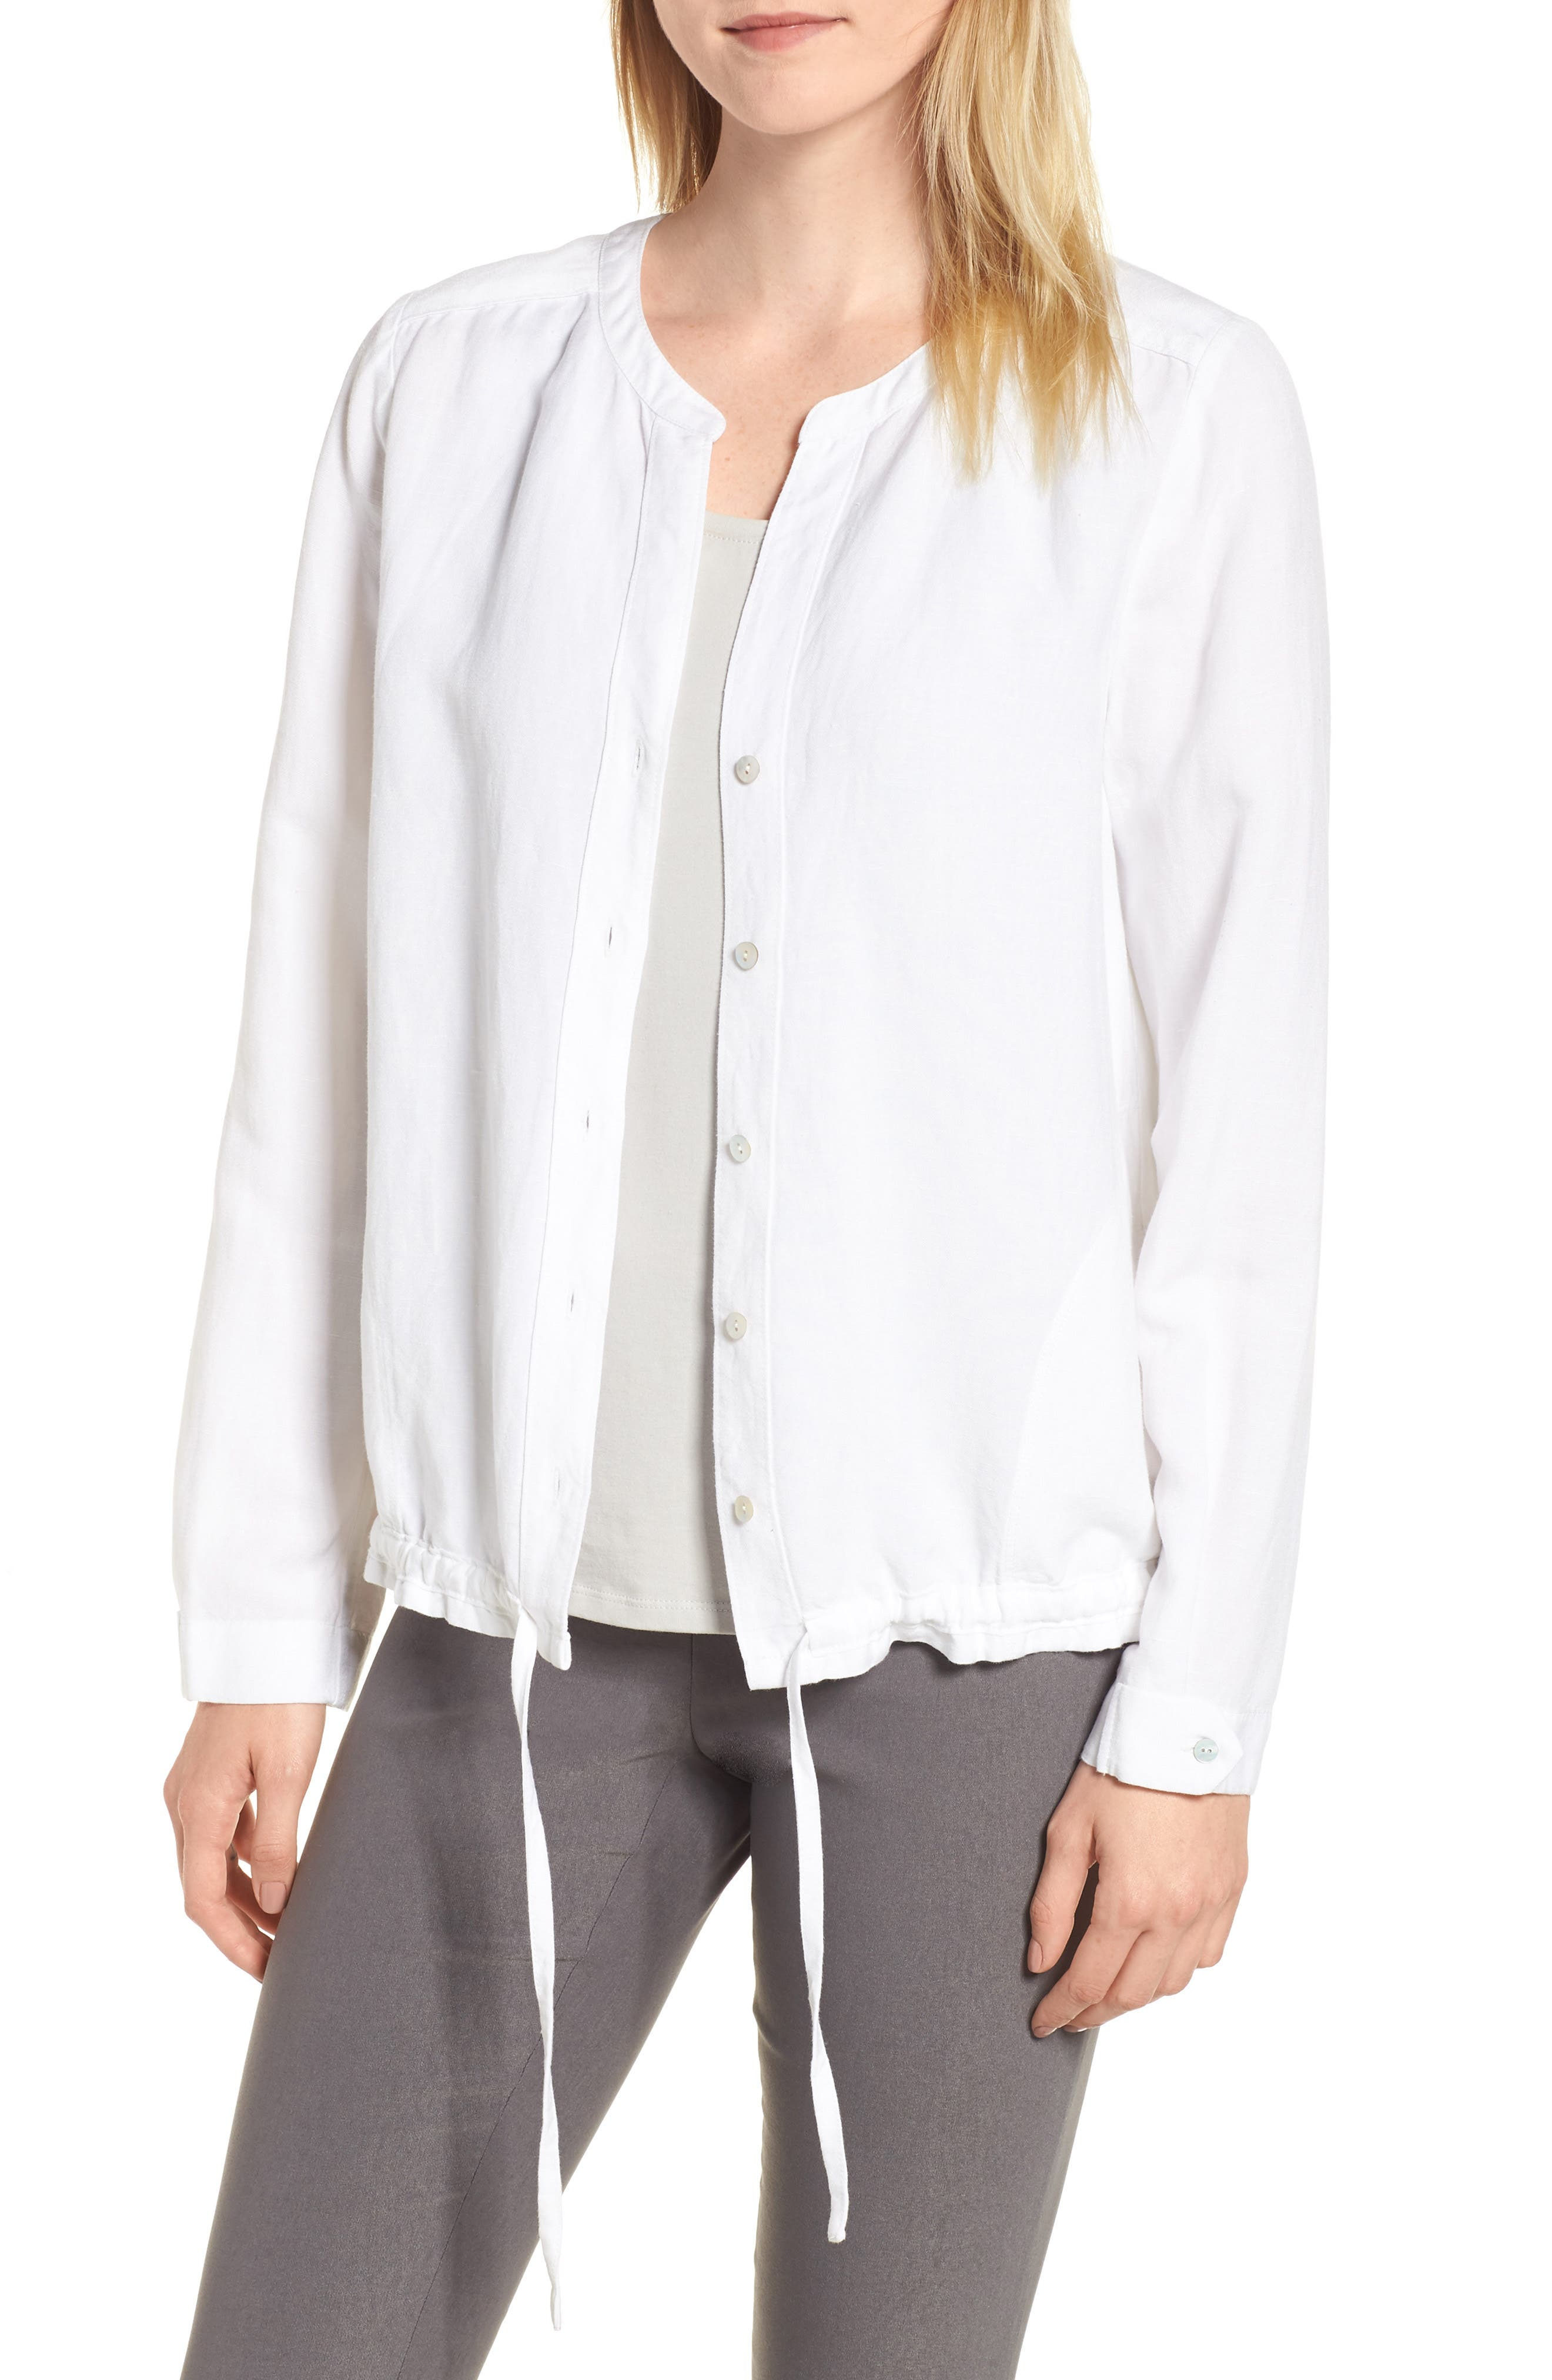 Homebound Linen Blend Drawstring Jacket,                             Main thumbnail 1, color,                             123